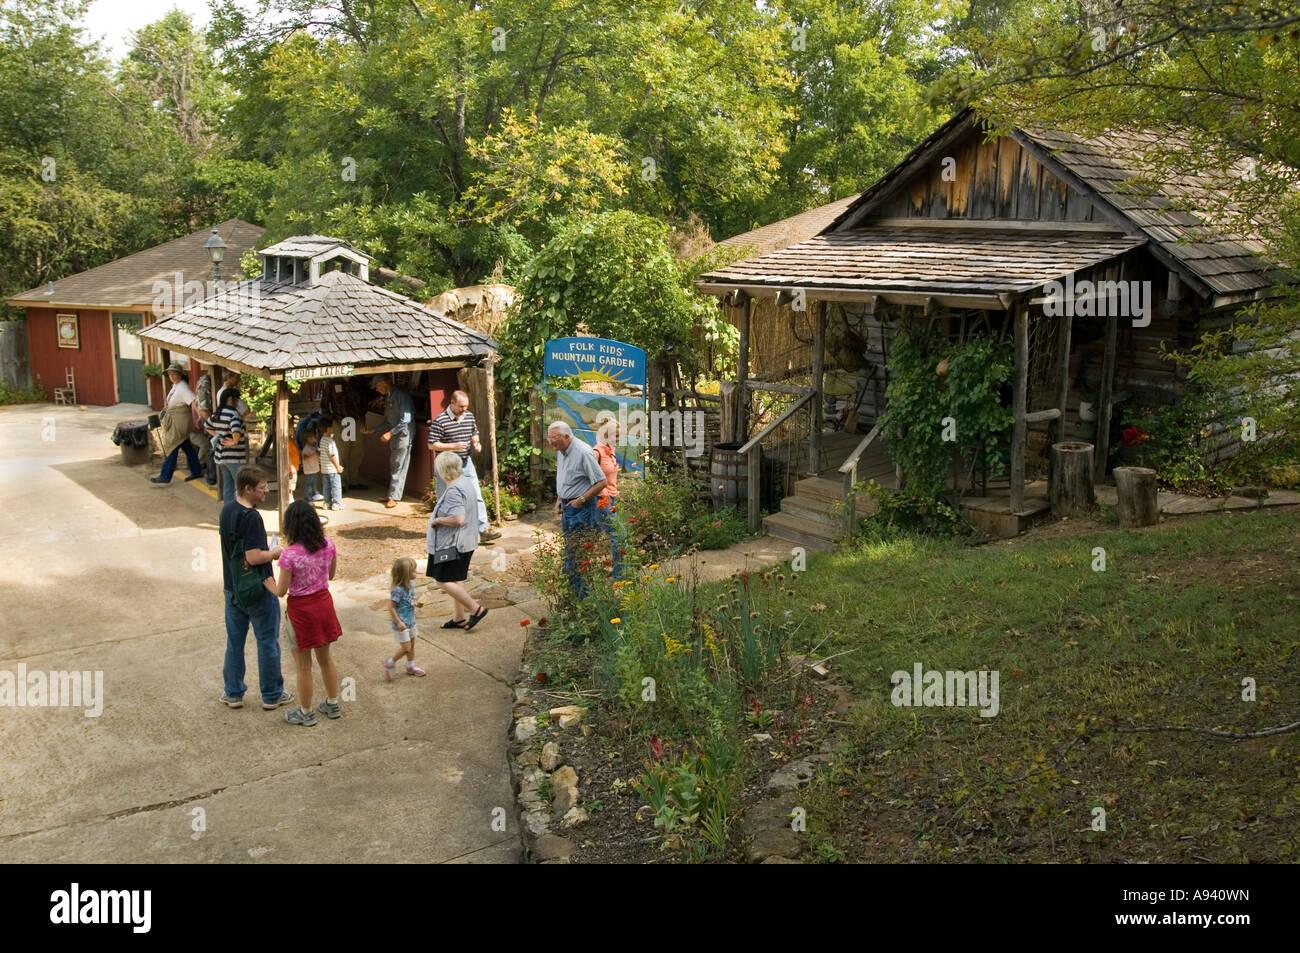 Families Visiting Folk Kids Mountain Stock Photos & Families ...